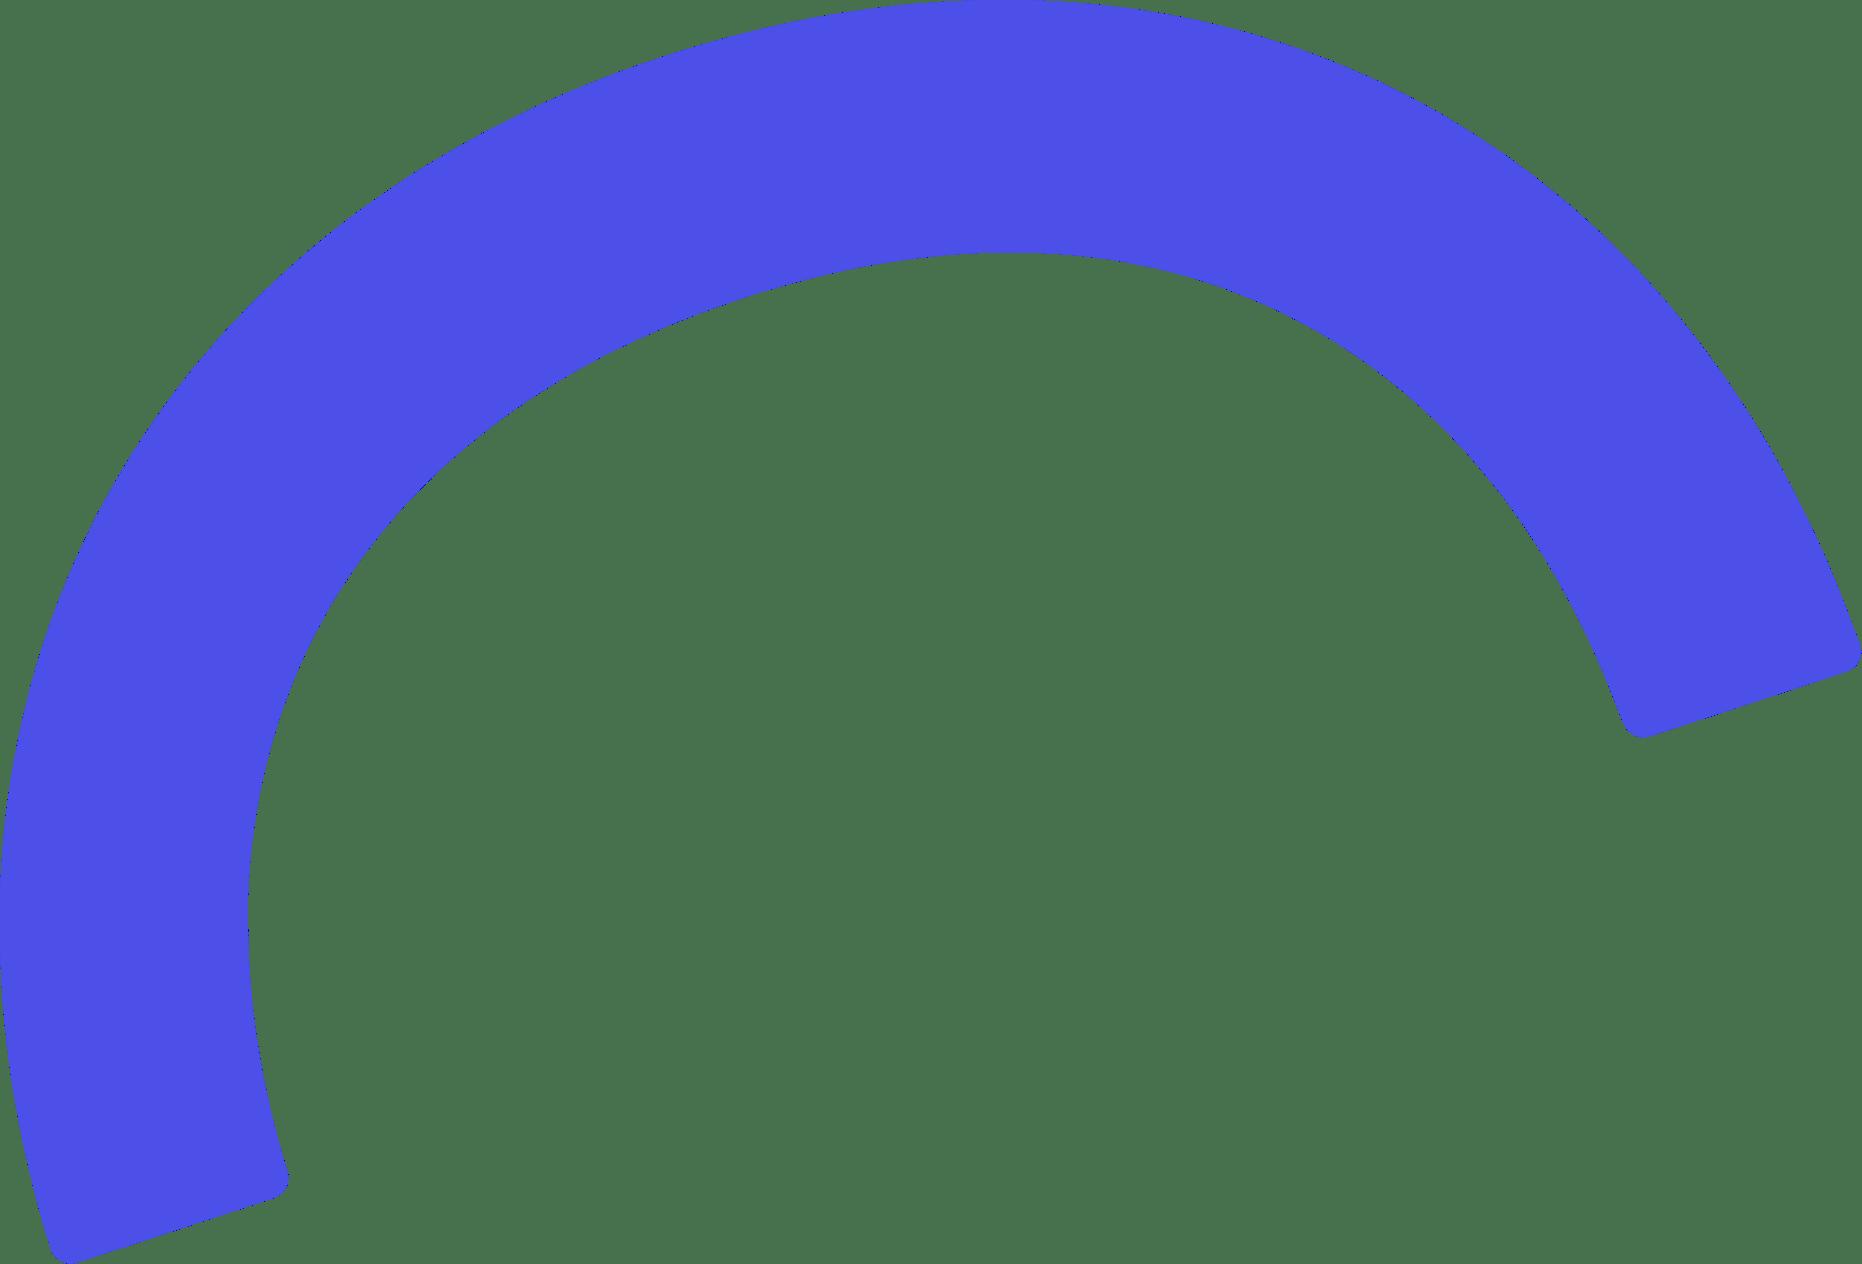 purple half circle